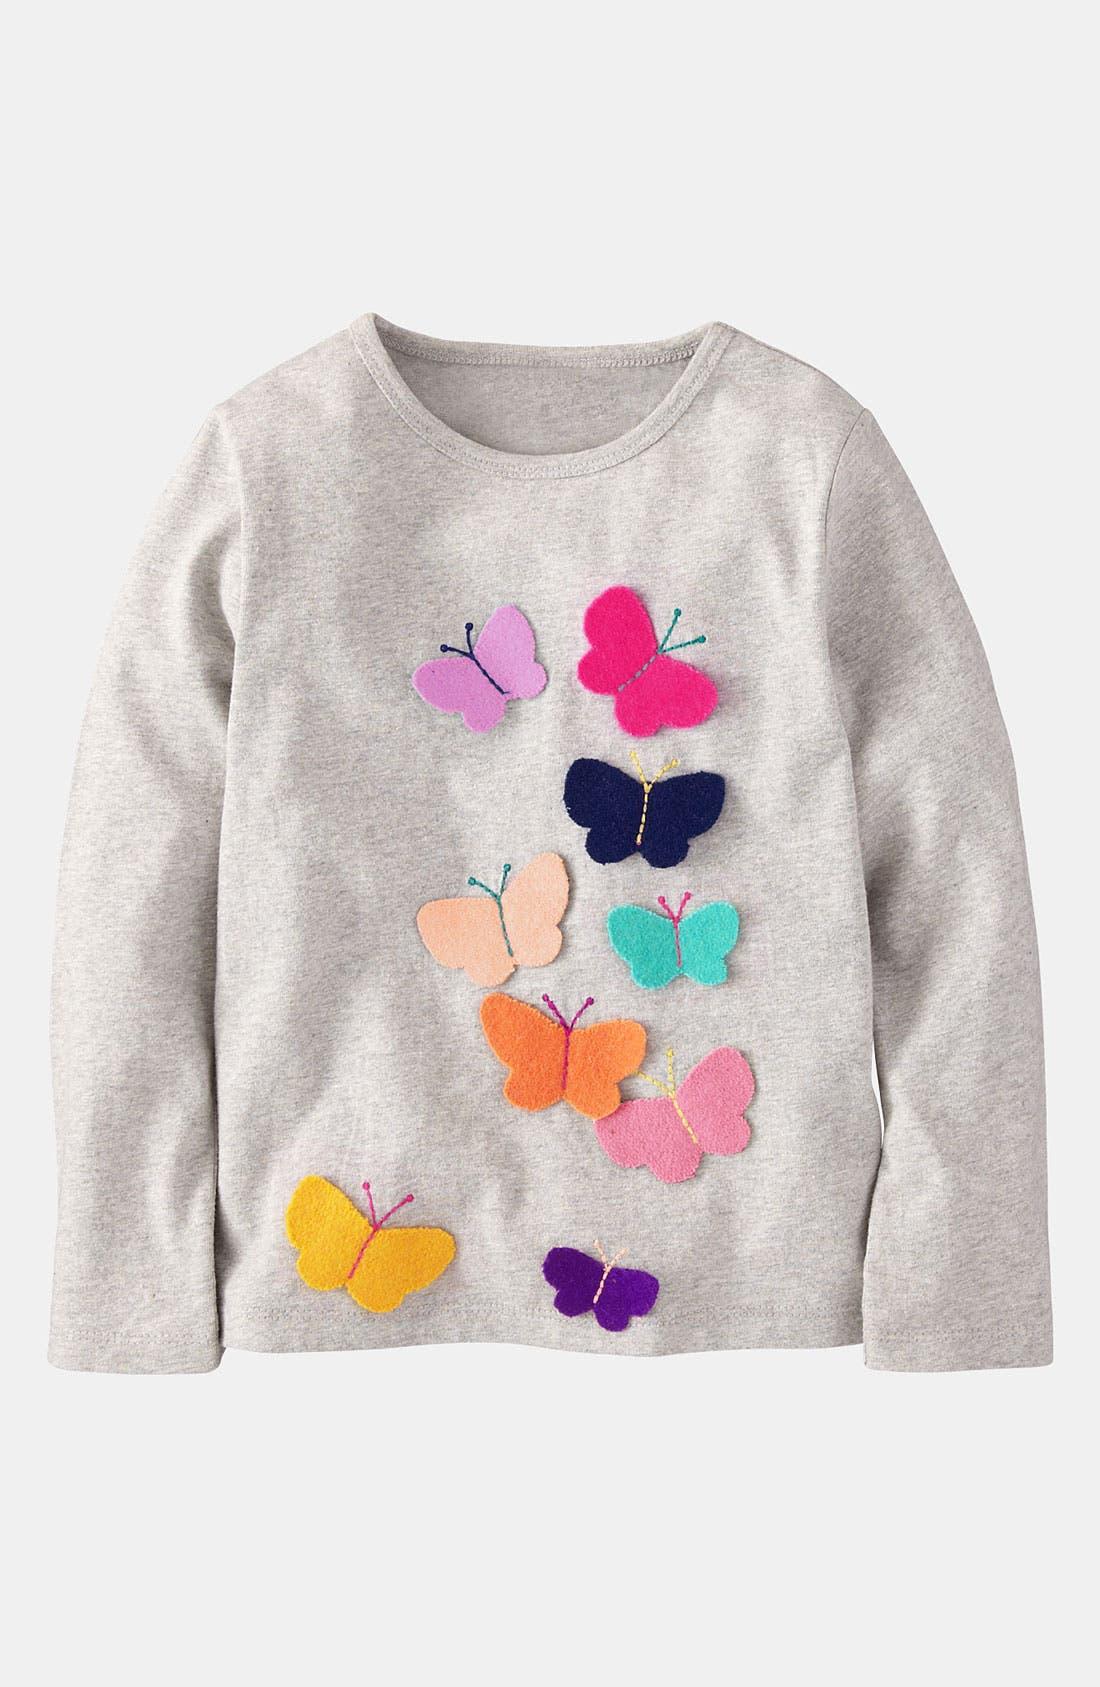 Alternate Image 1 Selected - Mini Boden 'Fluttery' Appliqué Tee (Little Girls & Big Girls)